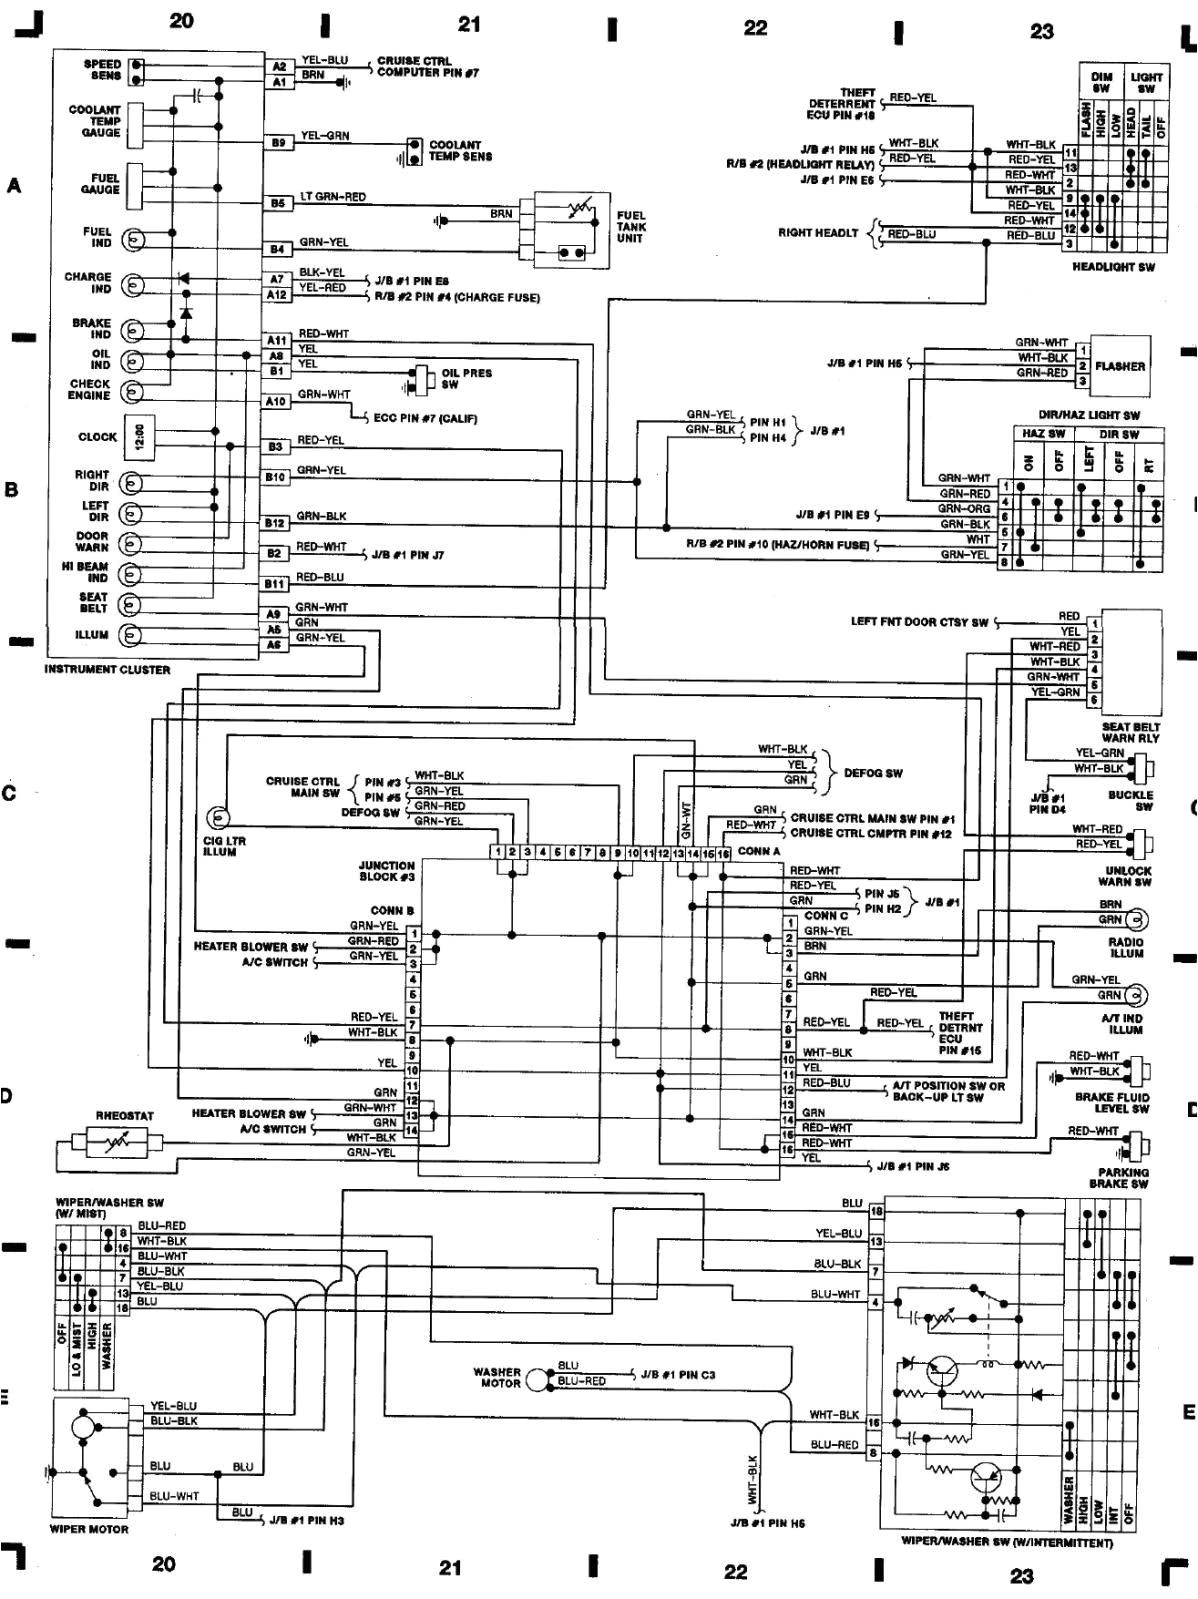 Toyota Auris Wiring Diagram toyota Auris Wiring Diagram Best Of toyota Yaris Ac Wiring Diagram